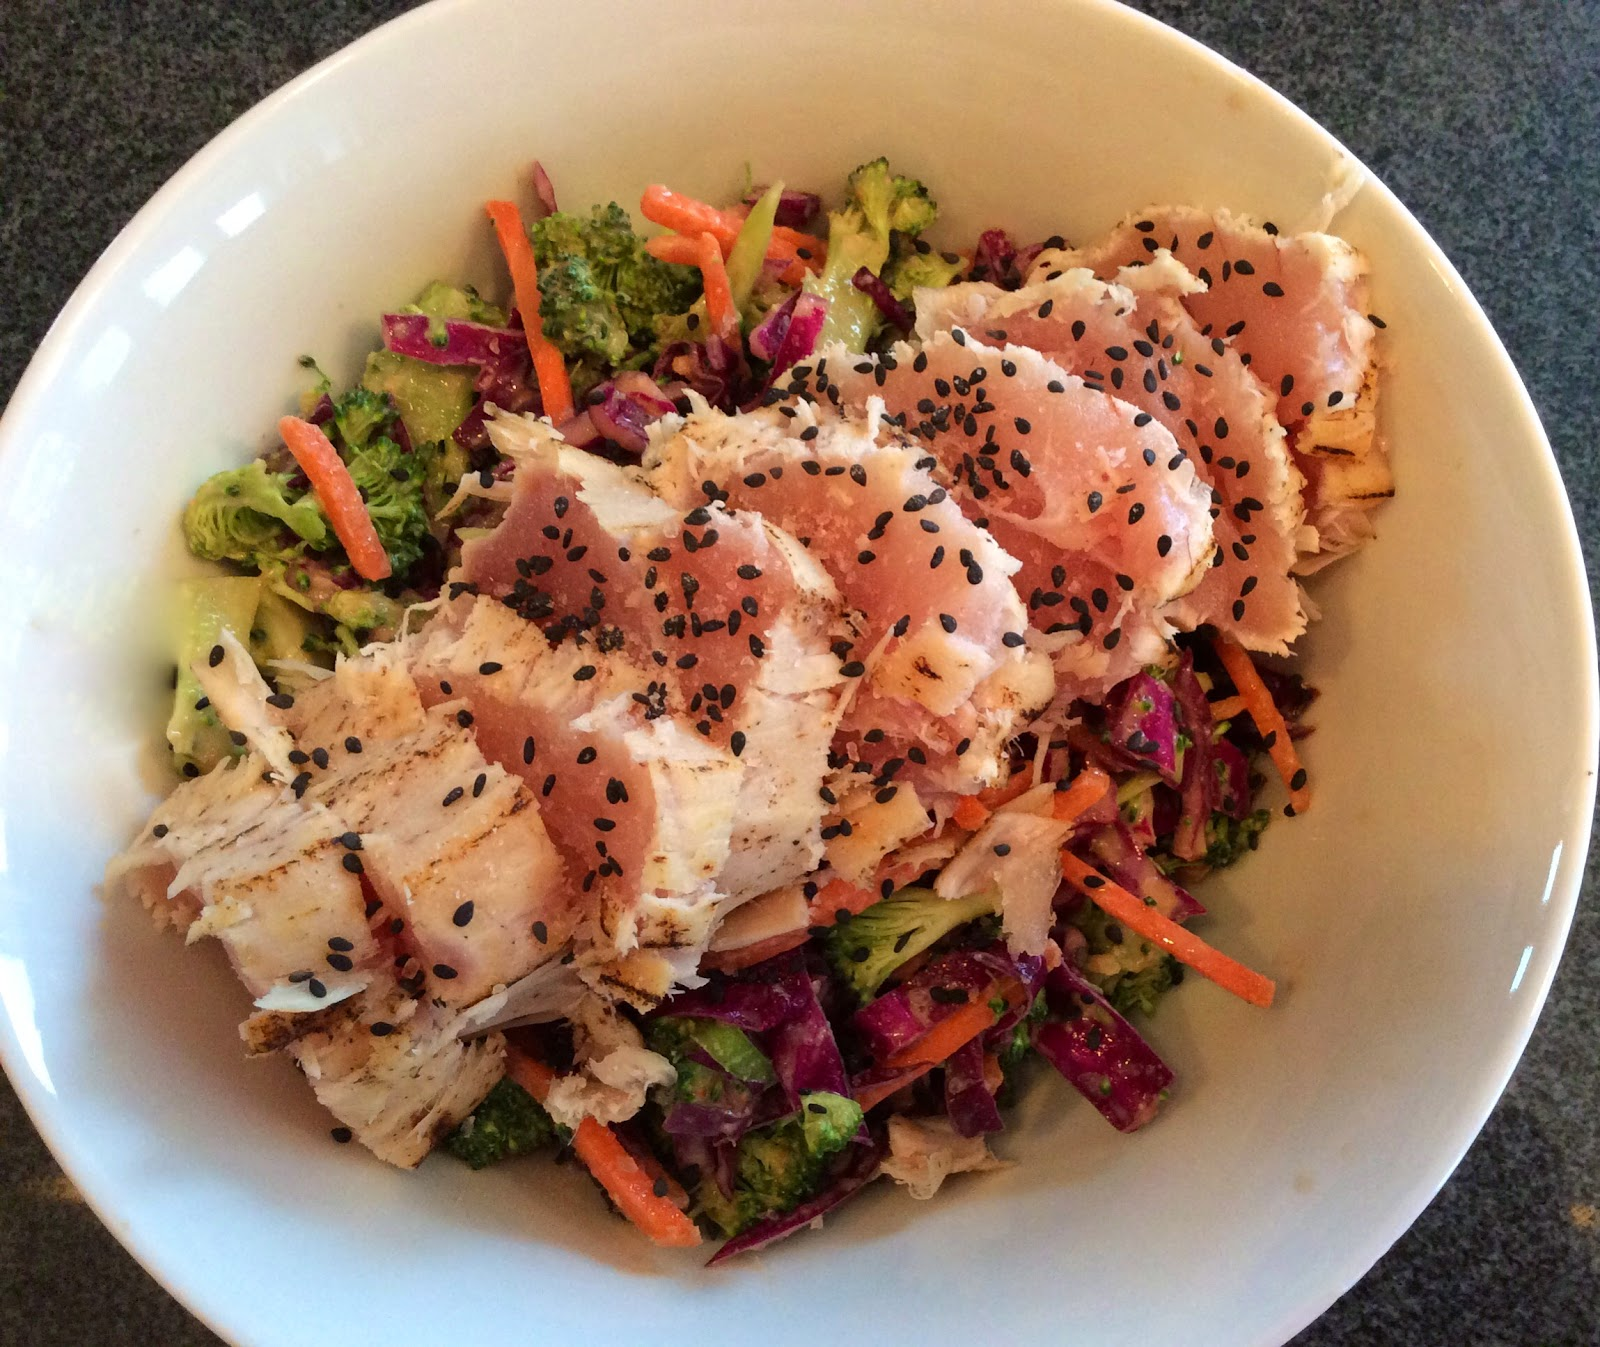 Pinks Pantry: Ahi Tuna Salad with Miso Slaw